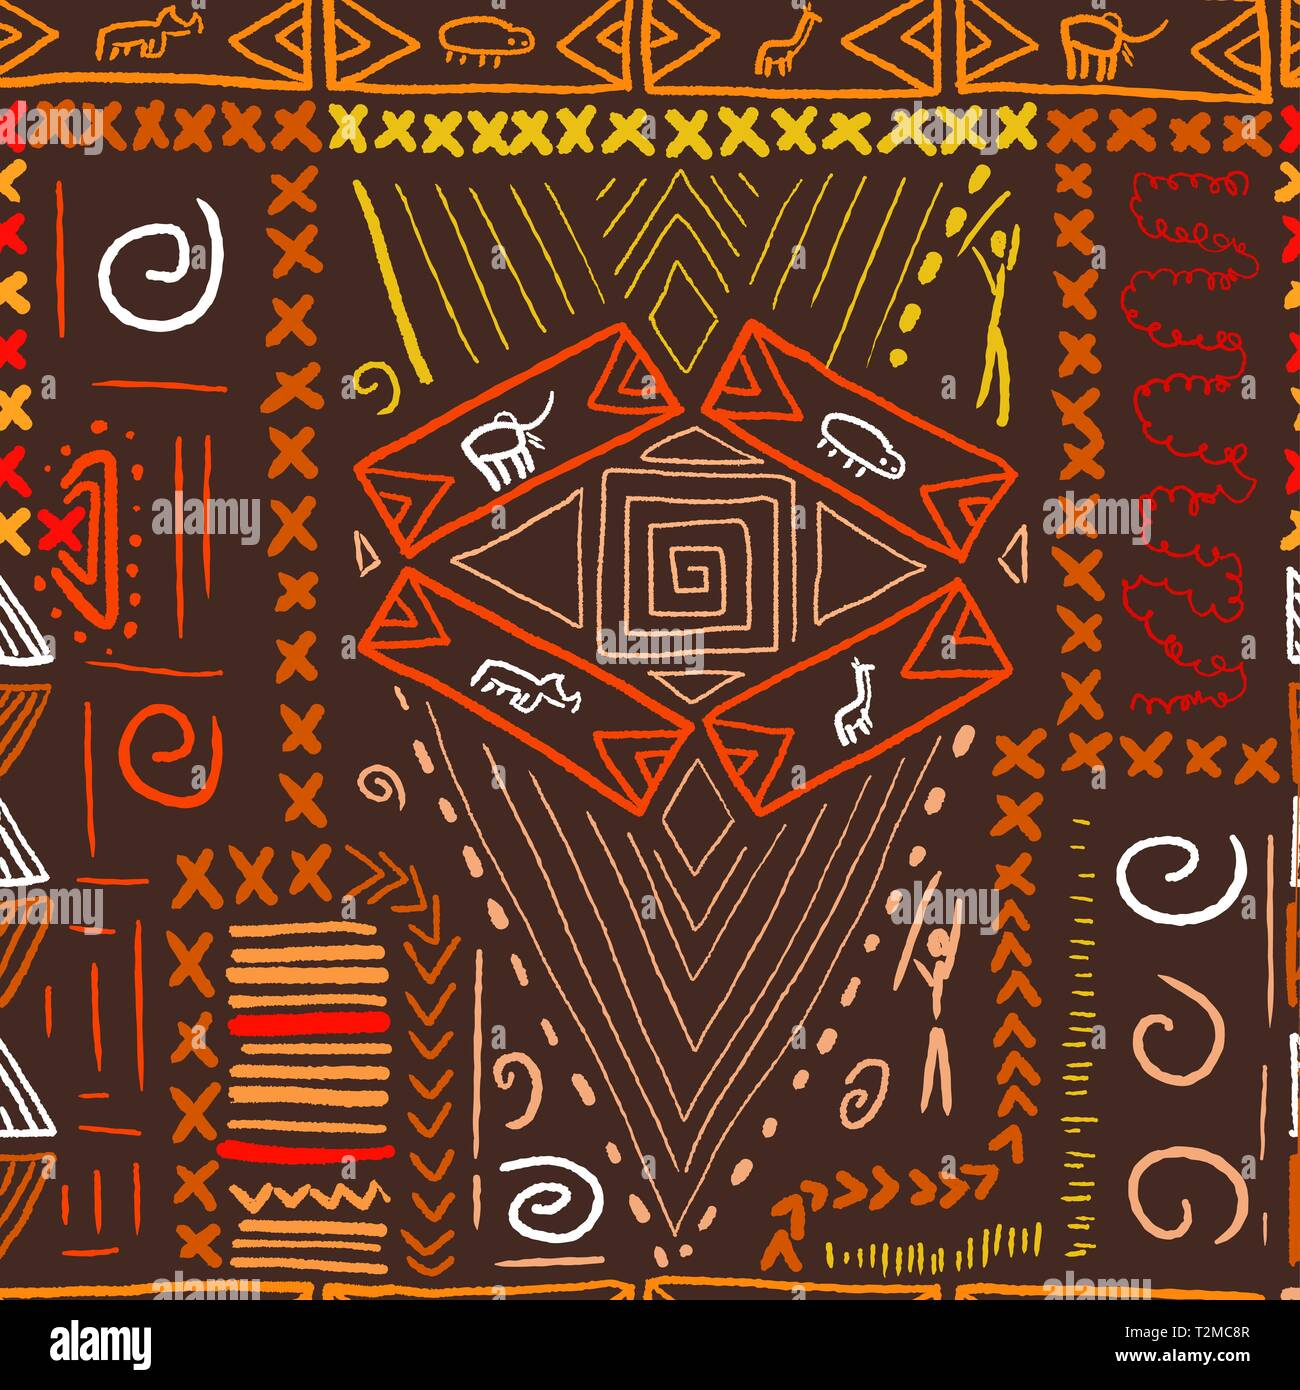 Amazon Com Notizbuch Afrika Karte Africa 10 2